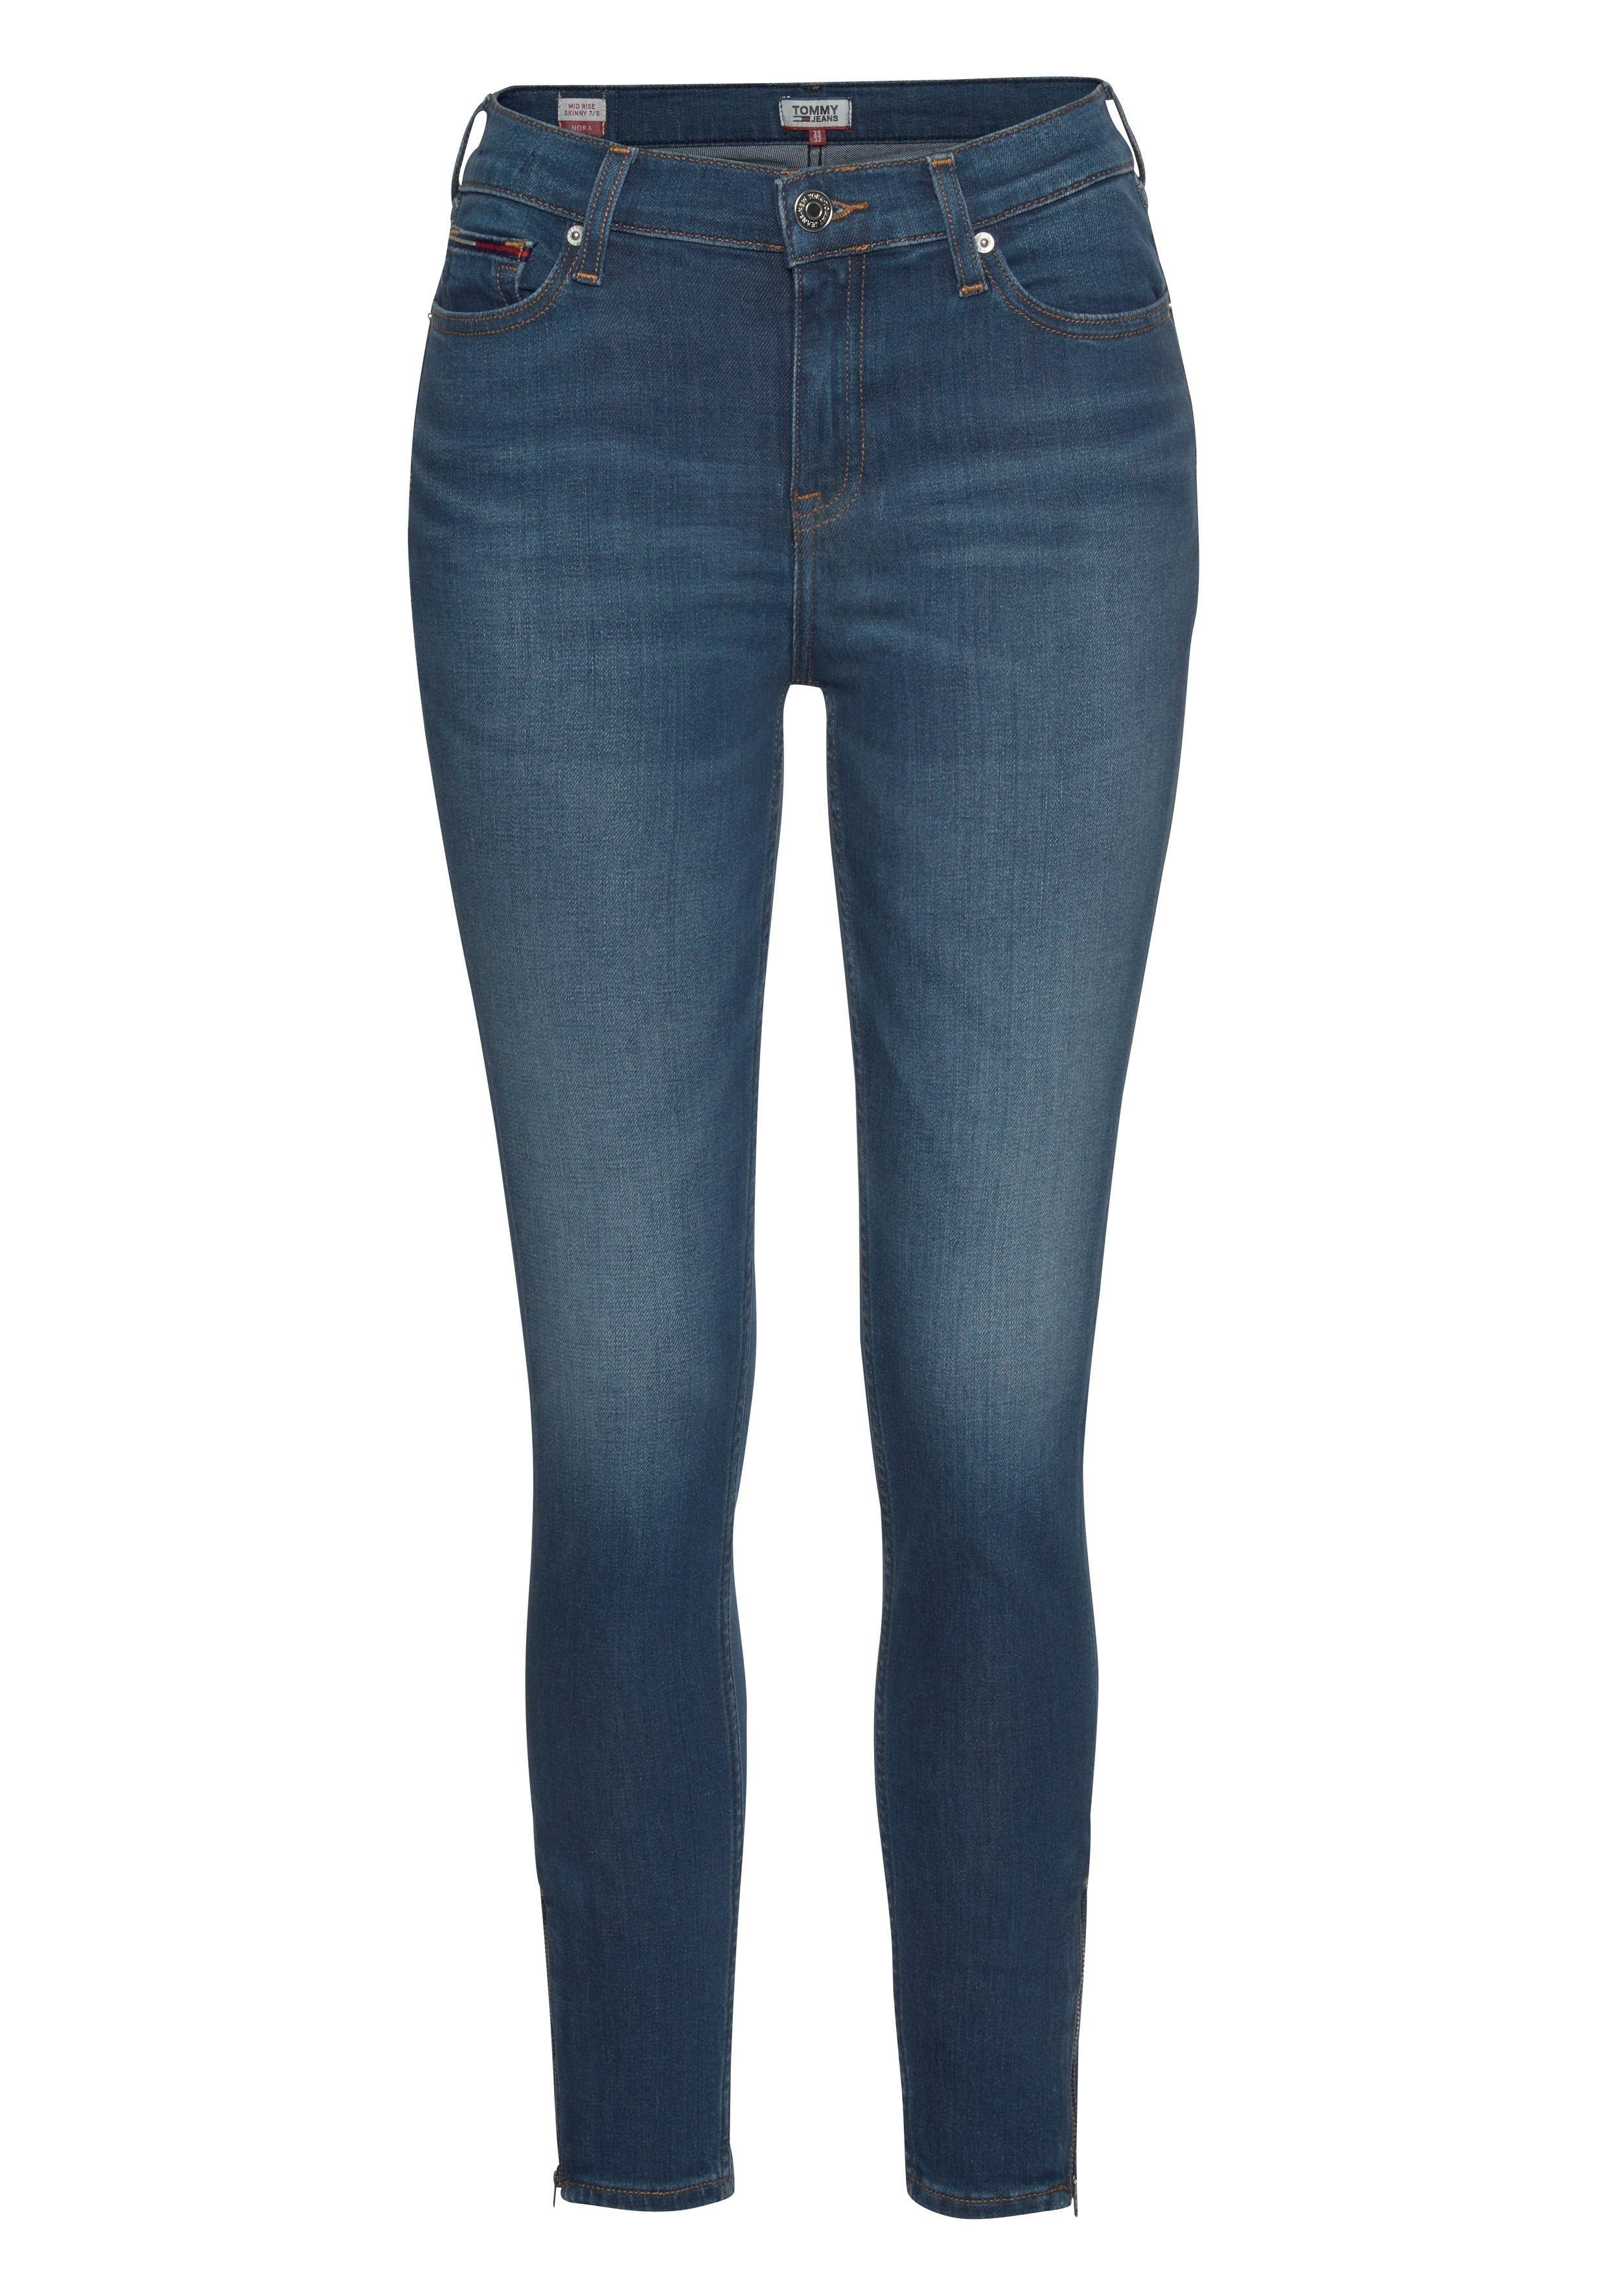 TOMMY JEANS 5-pocket jeans »Nora« veilig op otto.nl kopen